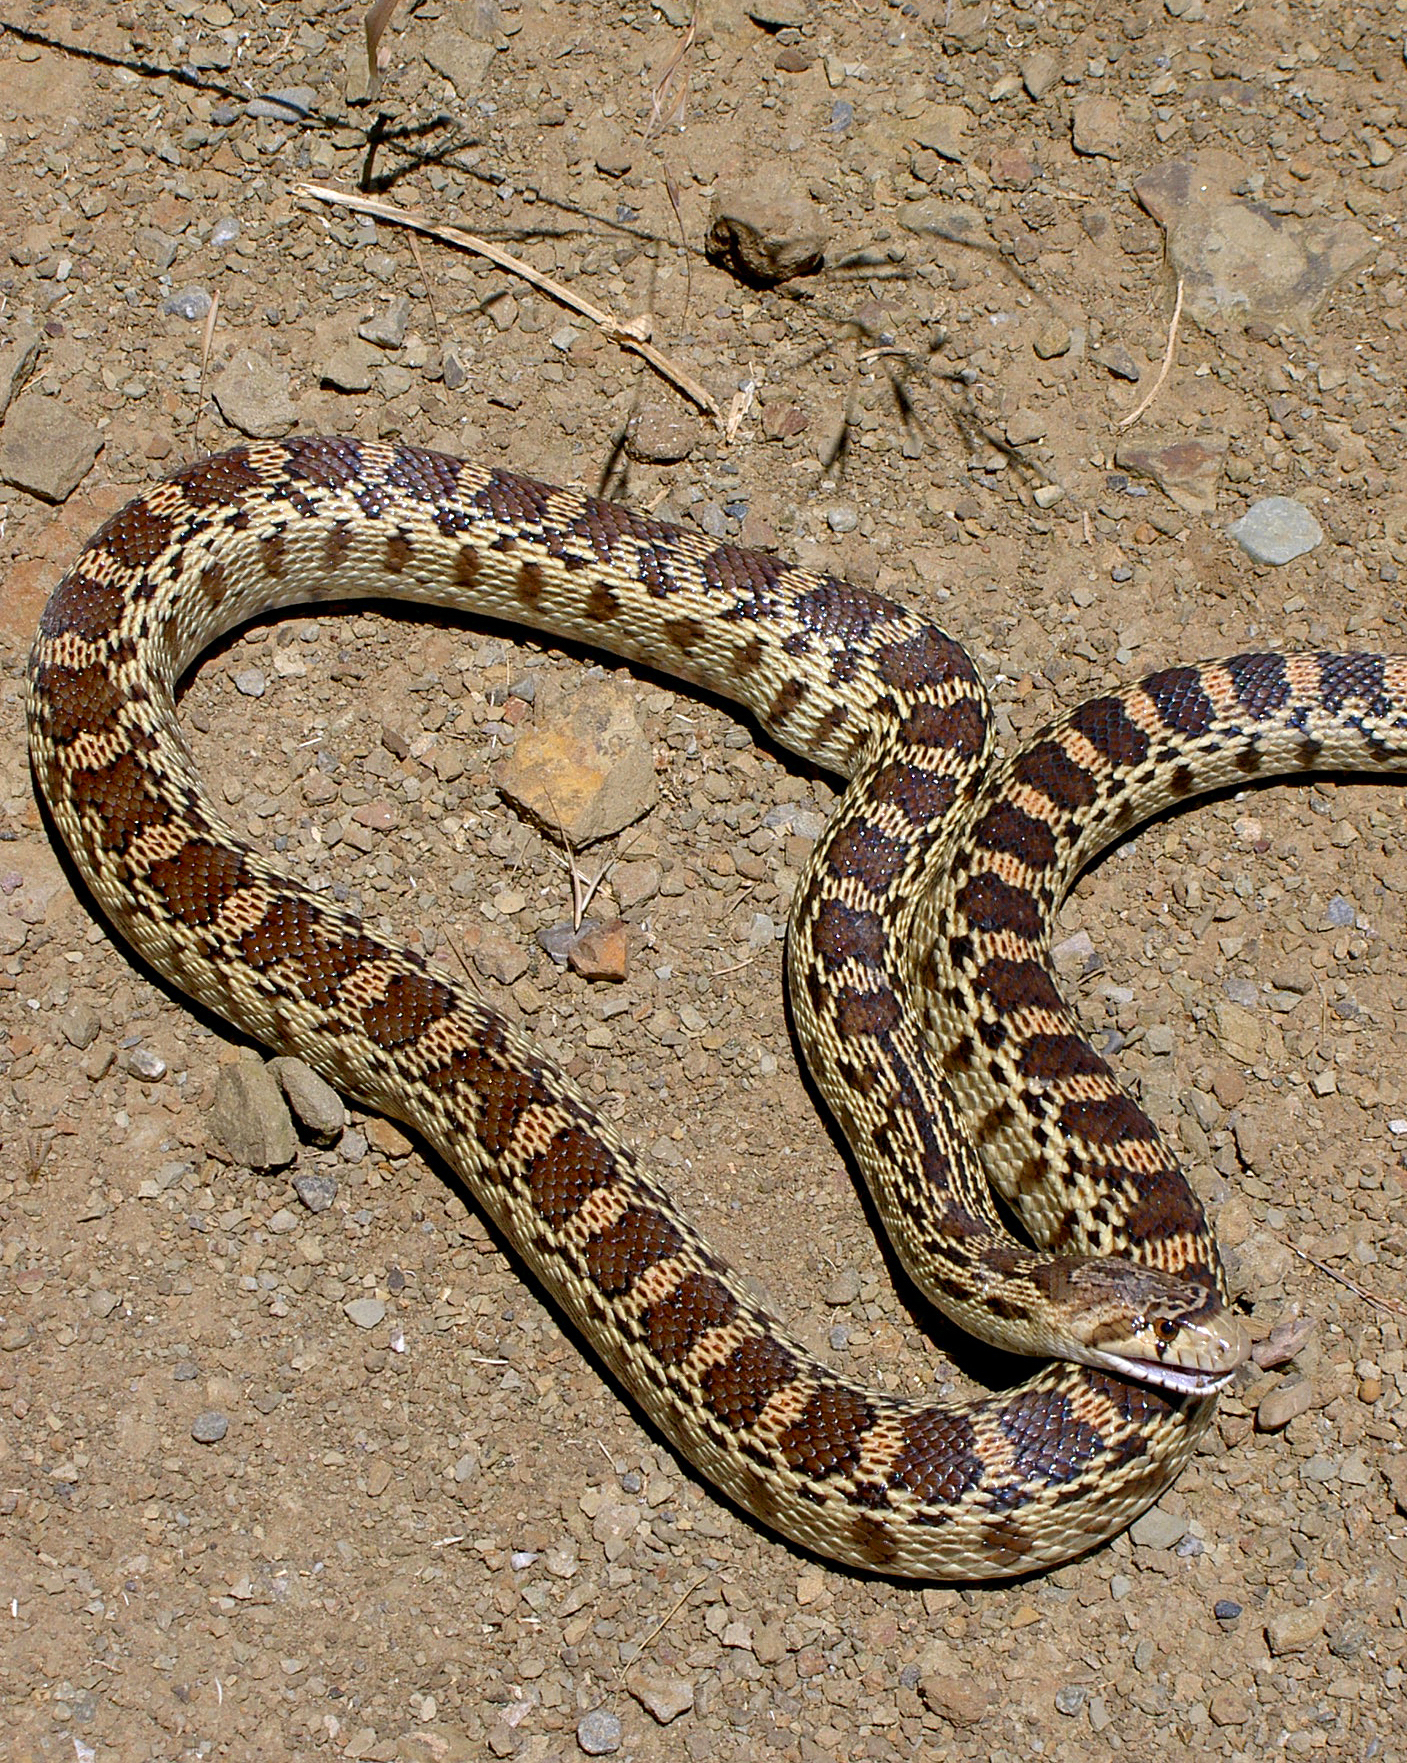 A non-venomous gopher snake hisses a warning at Los Vaqueros Watershed.